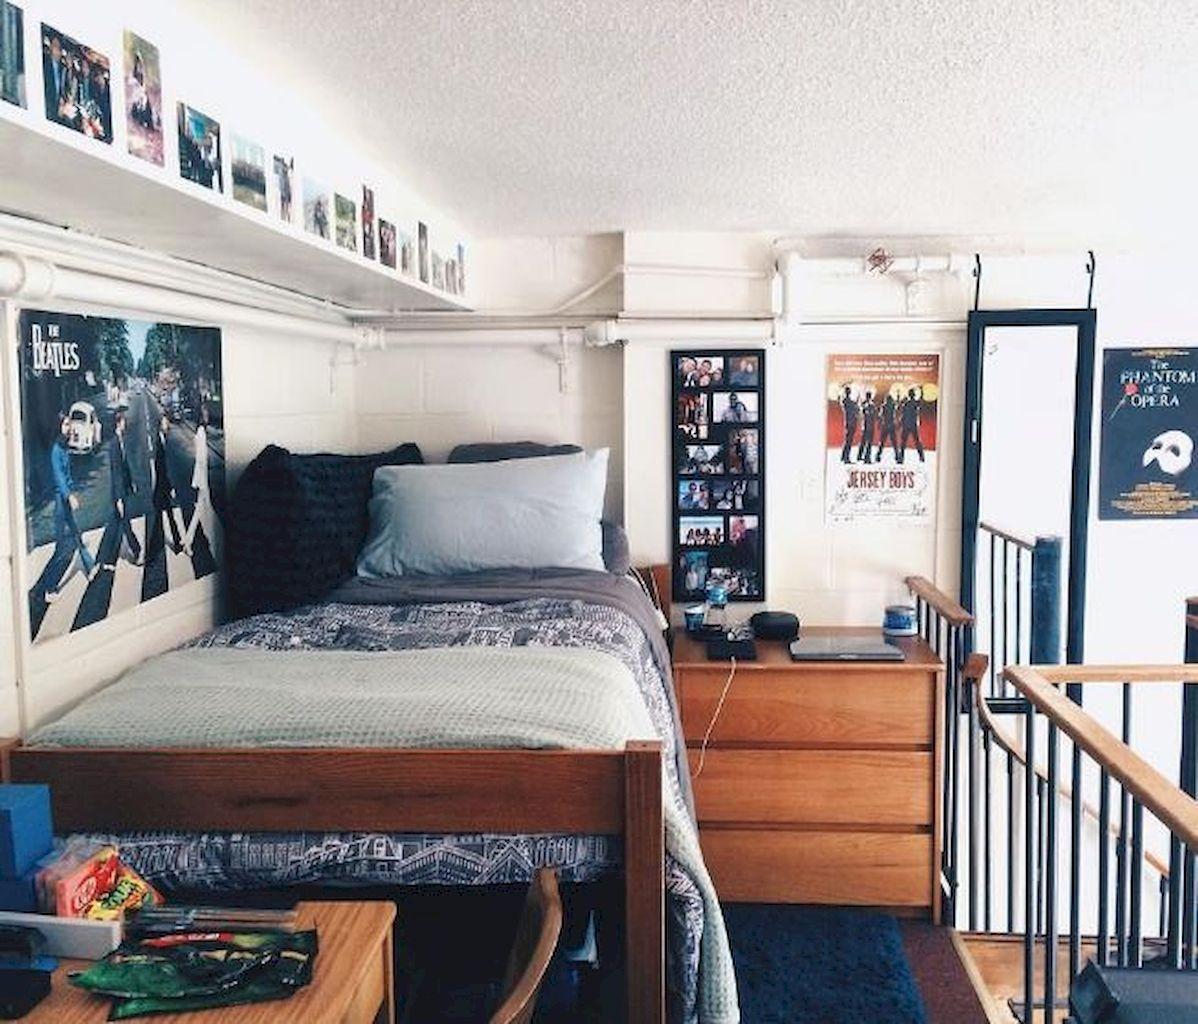 80 cute diy dorm room decorating ideas on a budget on diy home decor on a budget apartment ideas id=40561